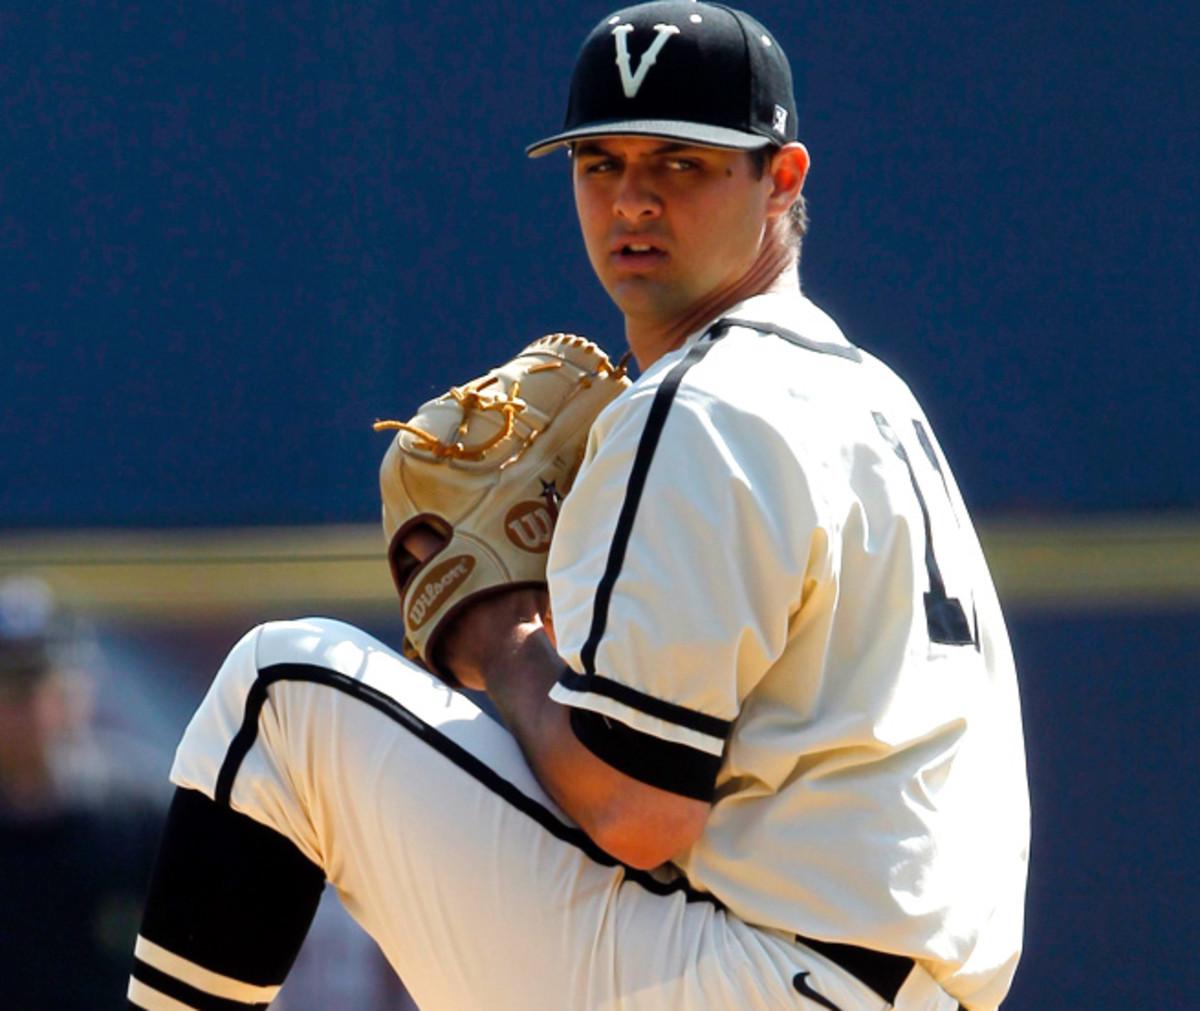 Vanderbilt right-hander Tyler Beede has seen his stock slip after a lackluster spring campaign.